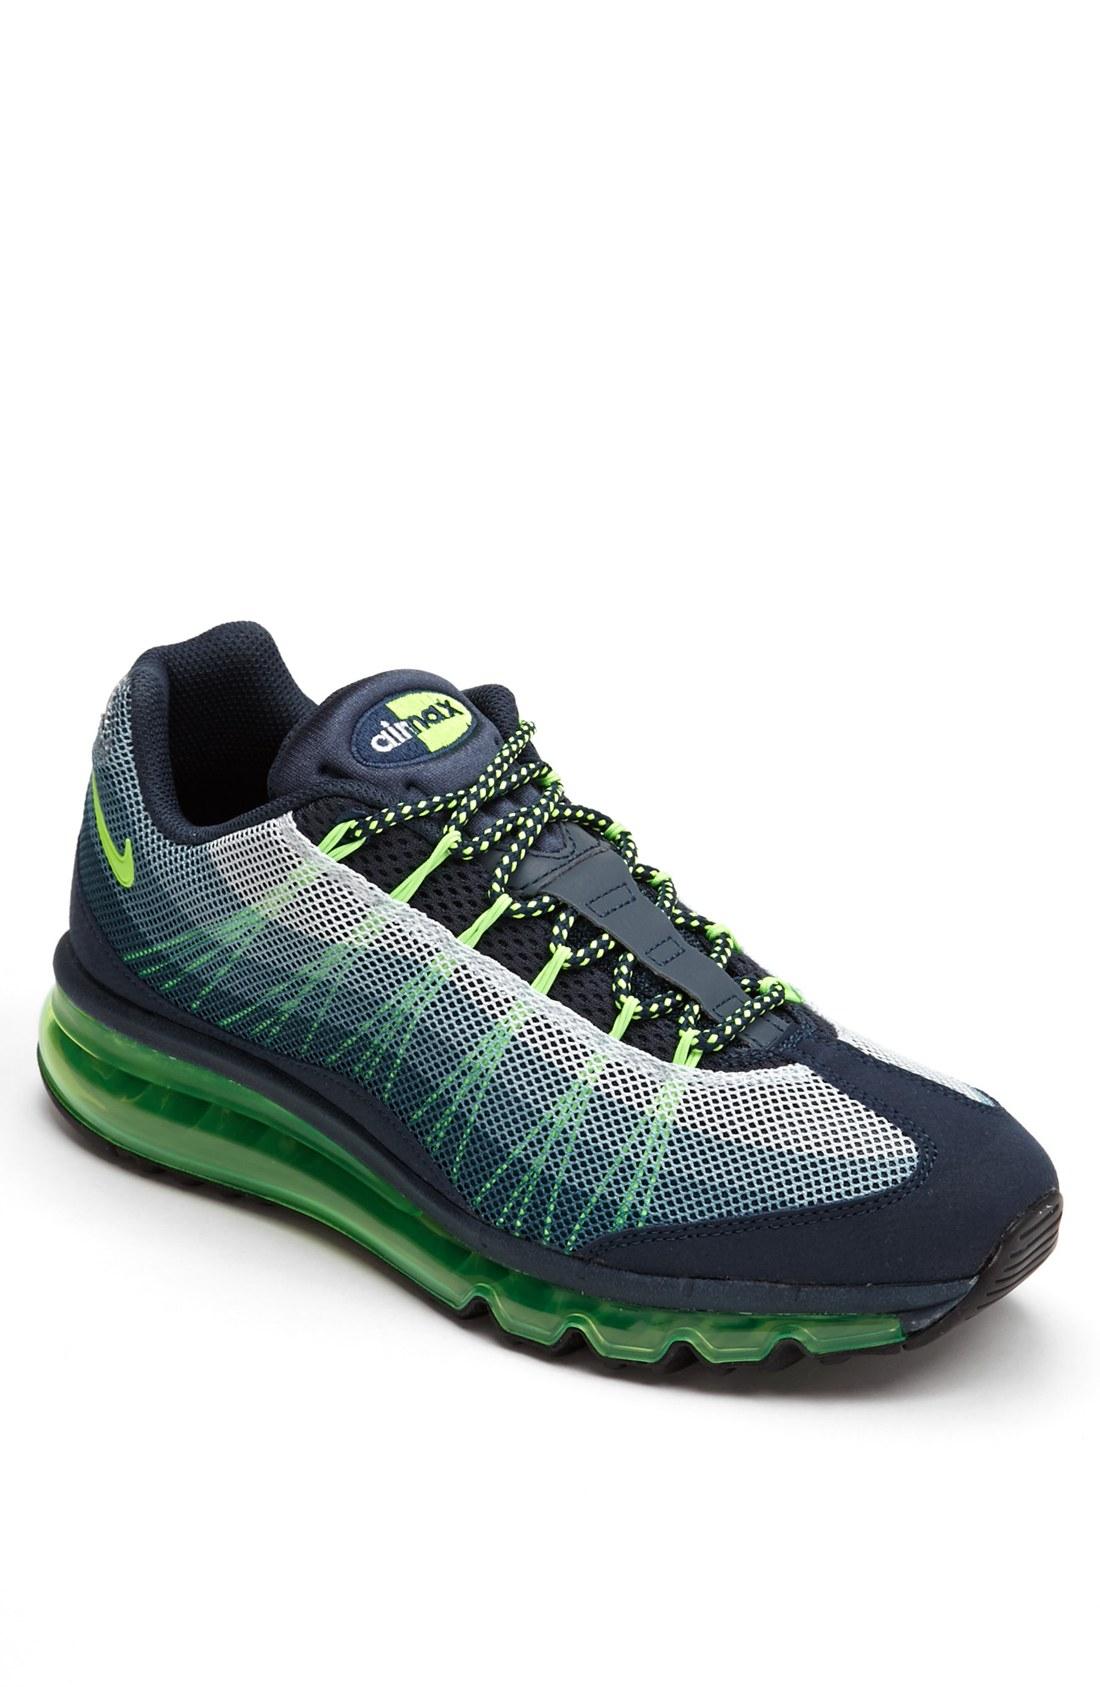 Nike Flash Leather Shoes